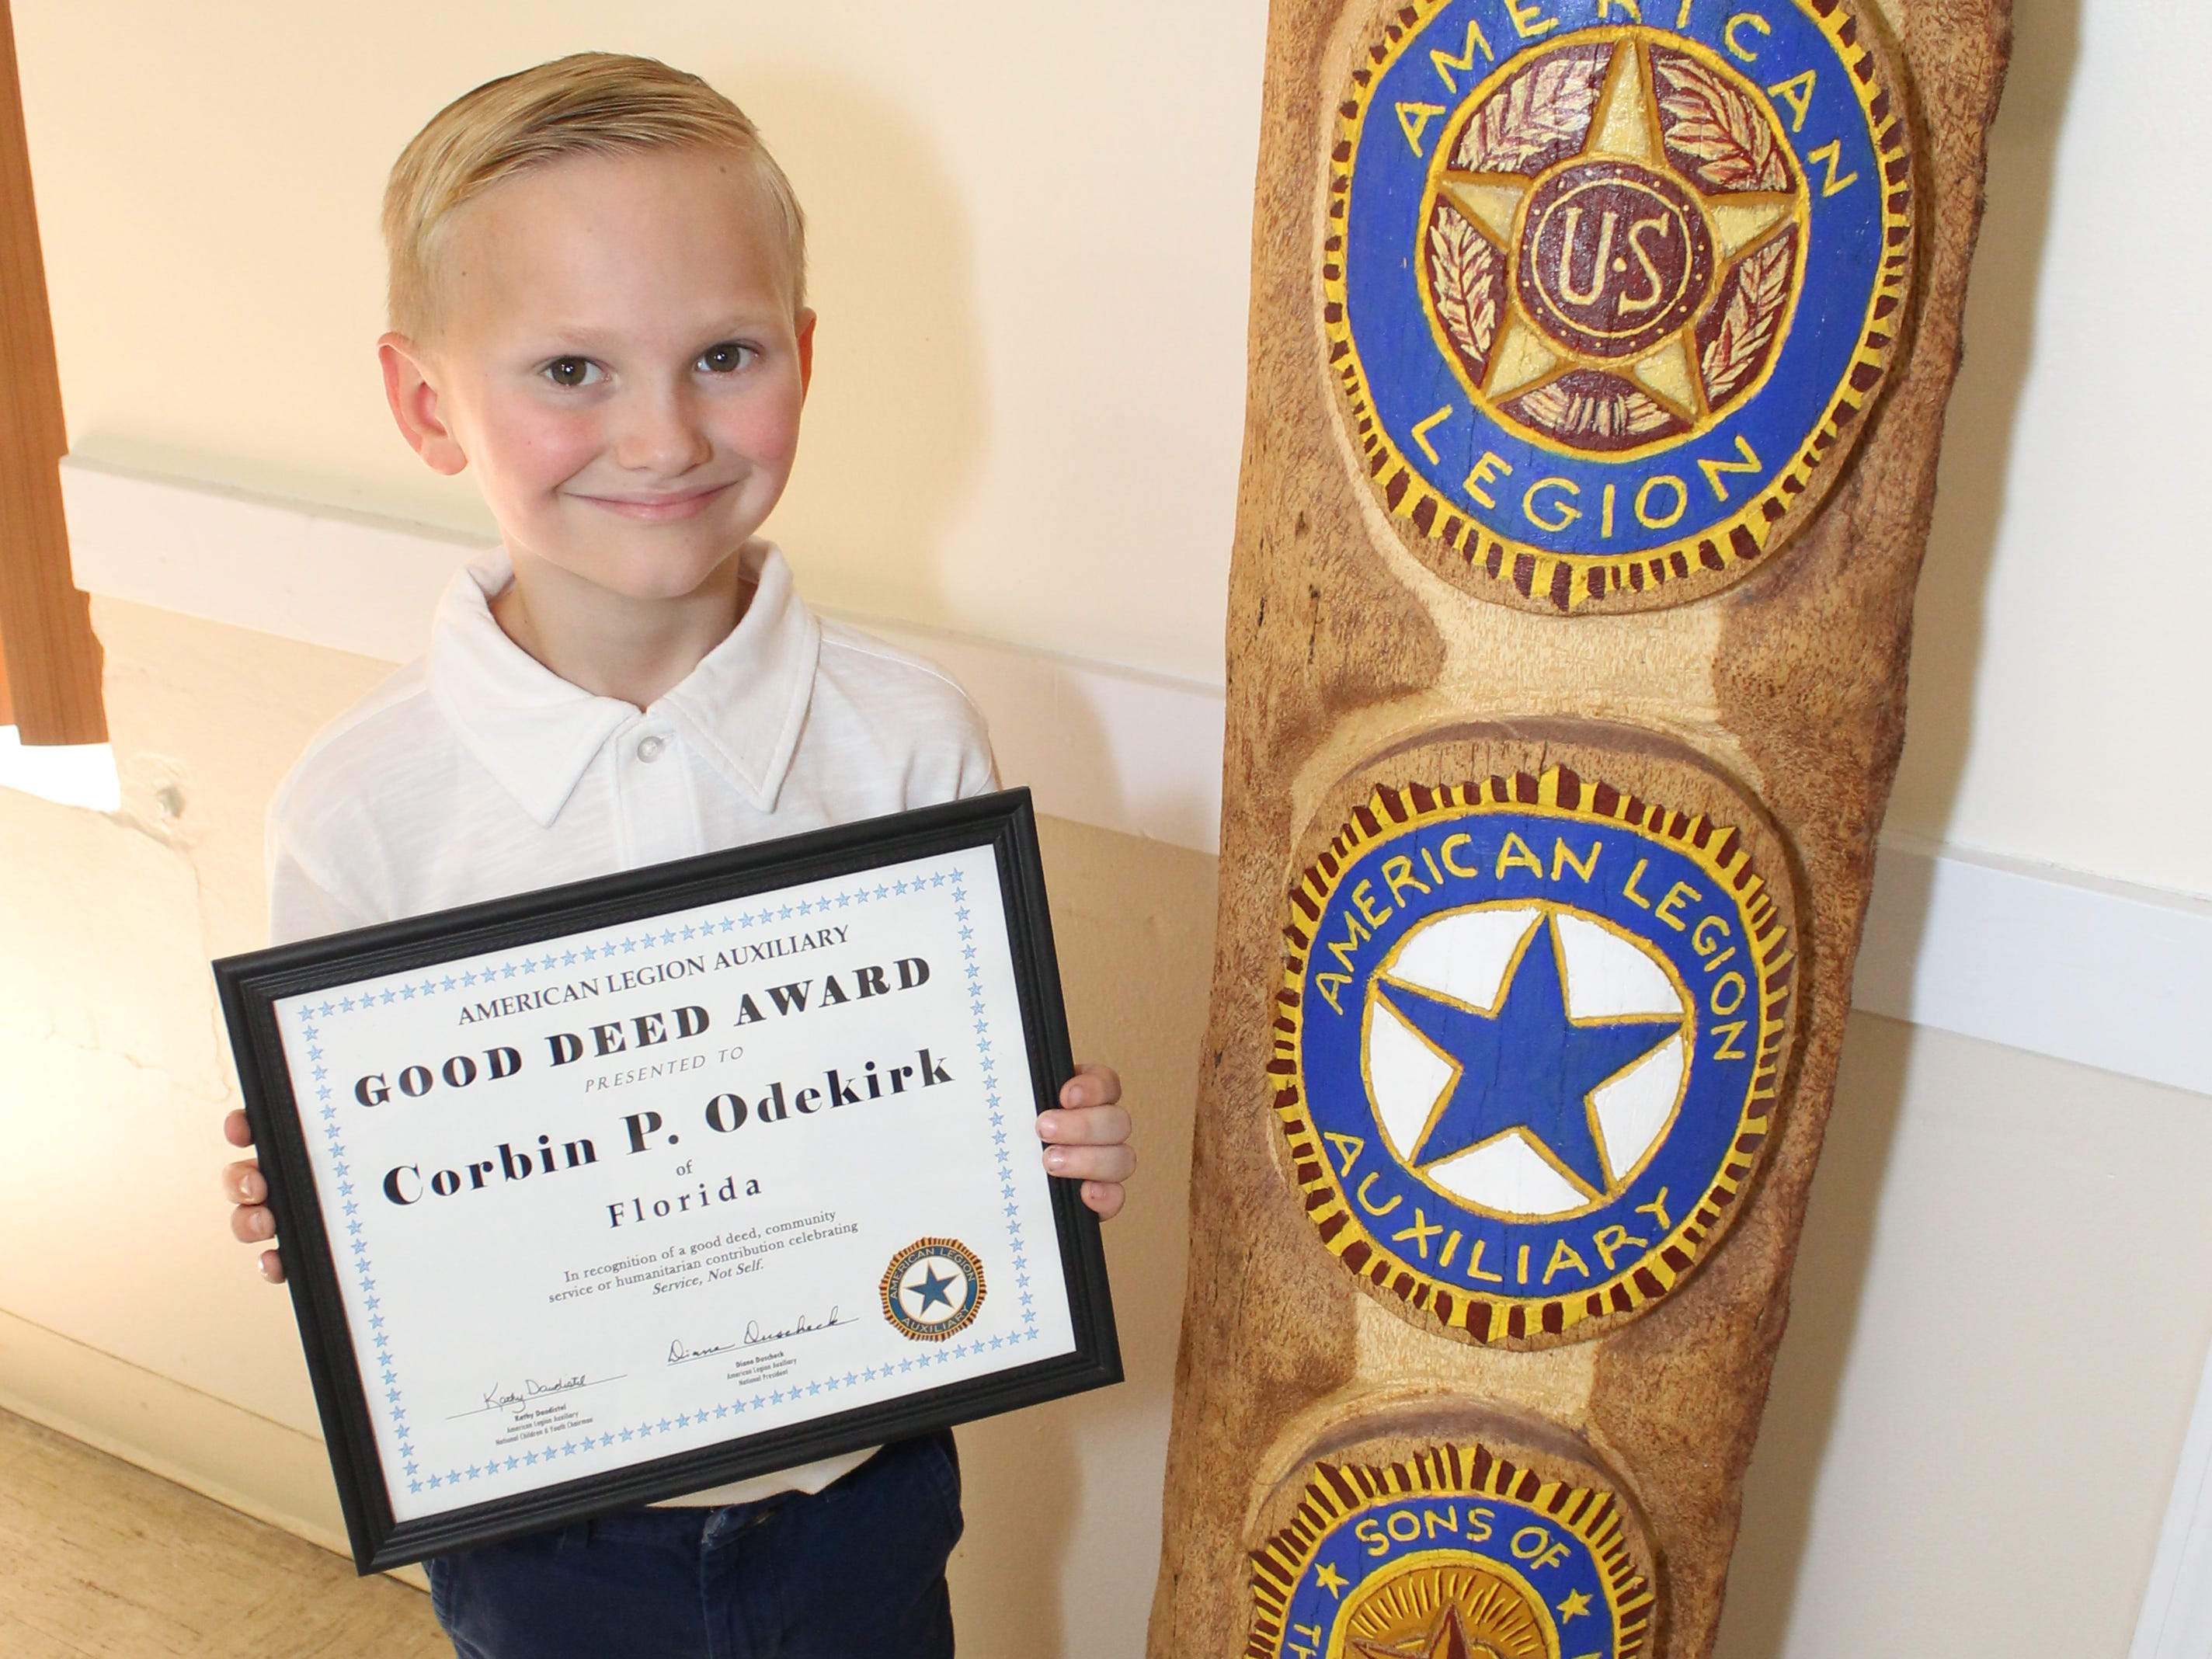 Corbin Odekirk with his Good Deed award